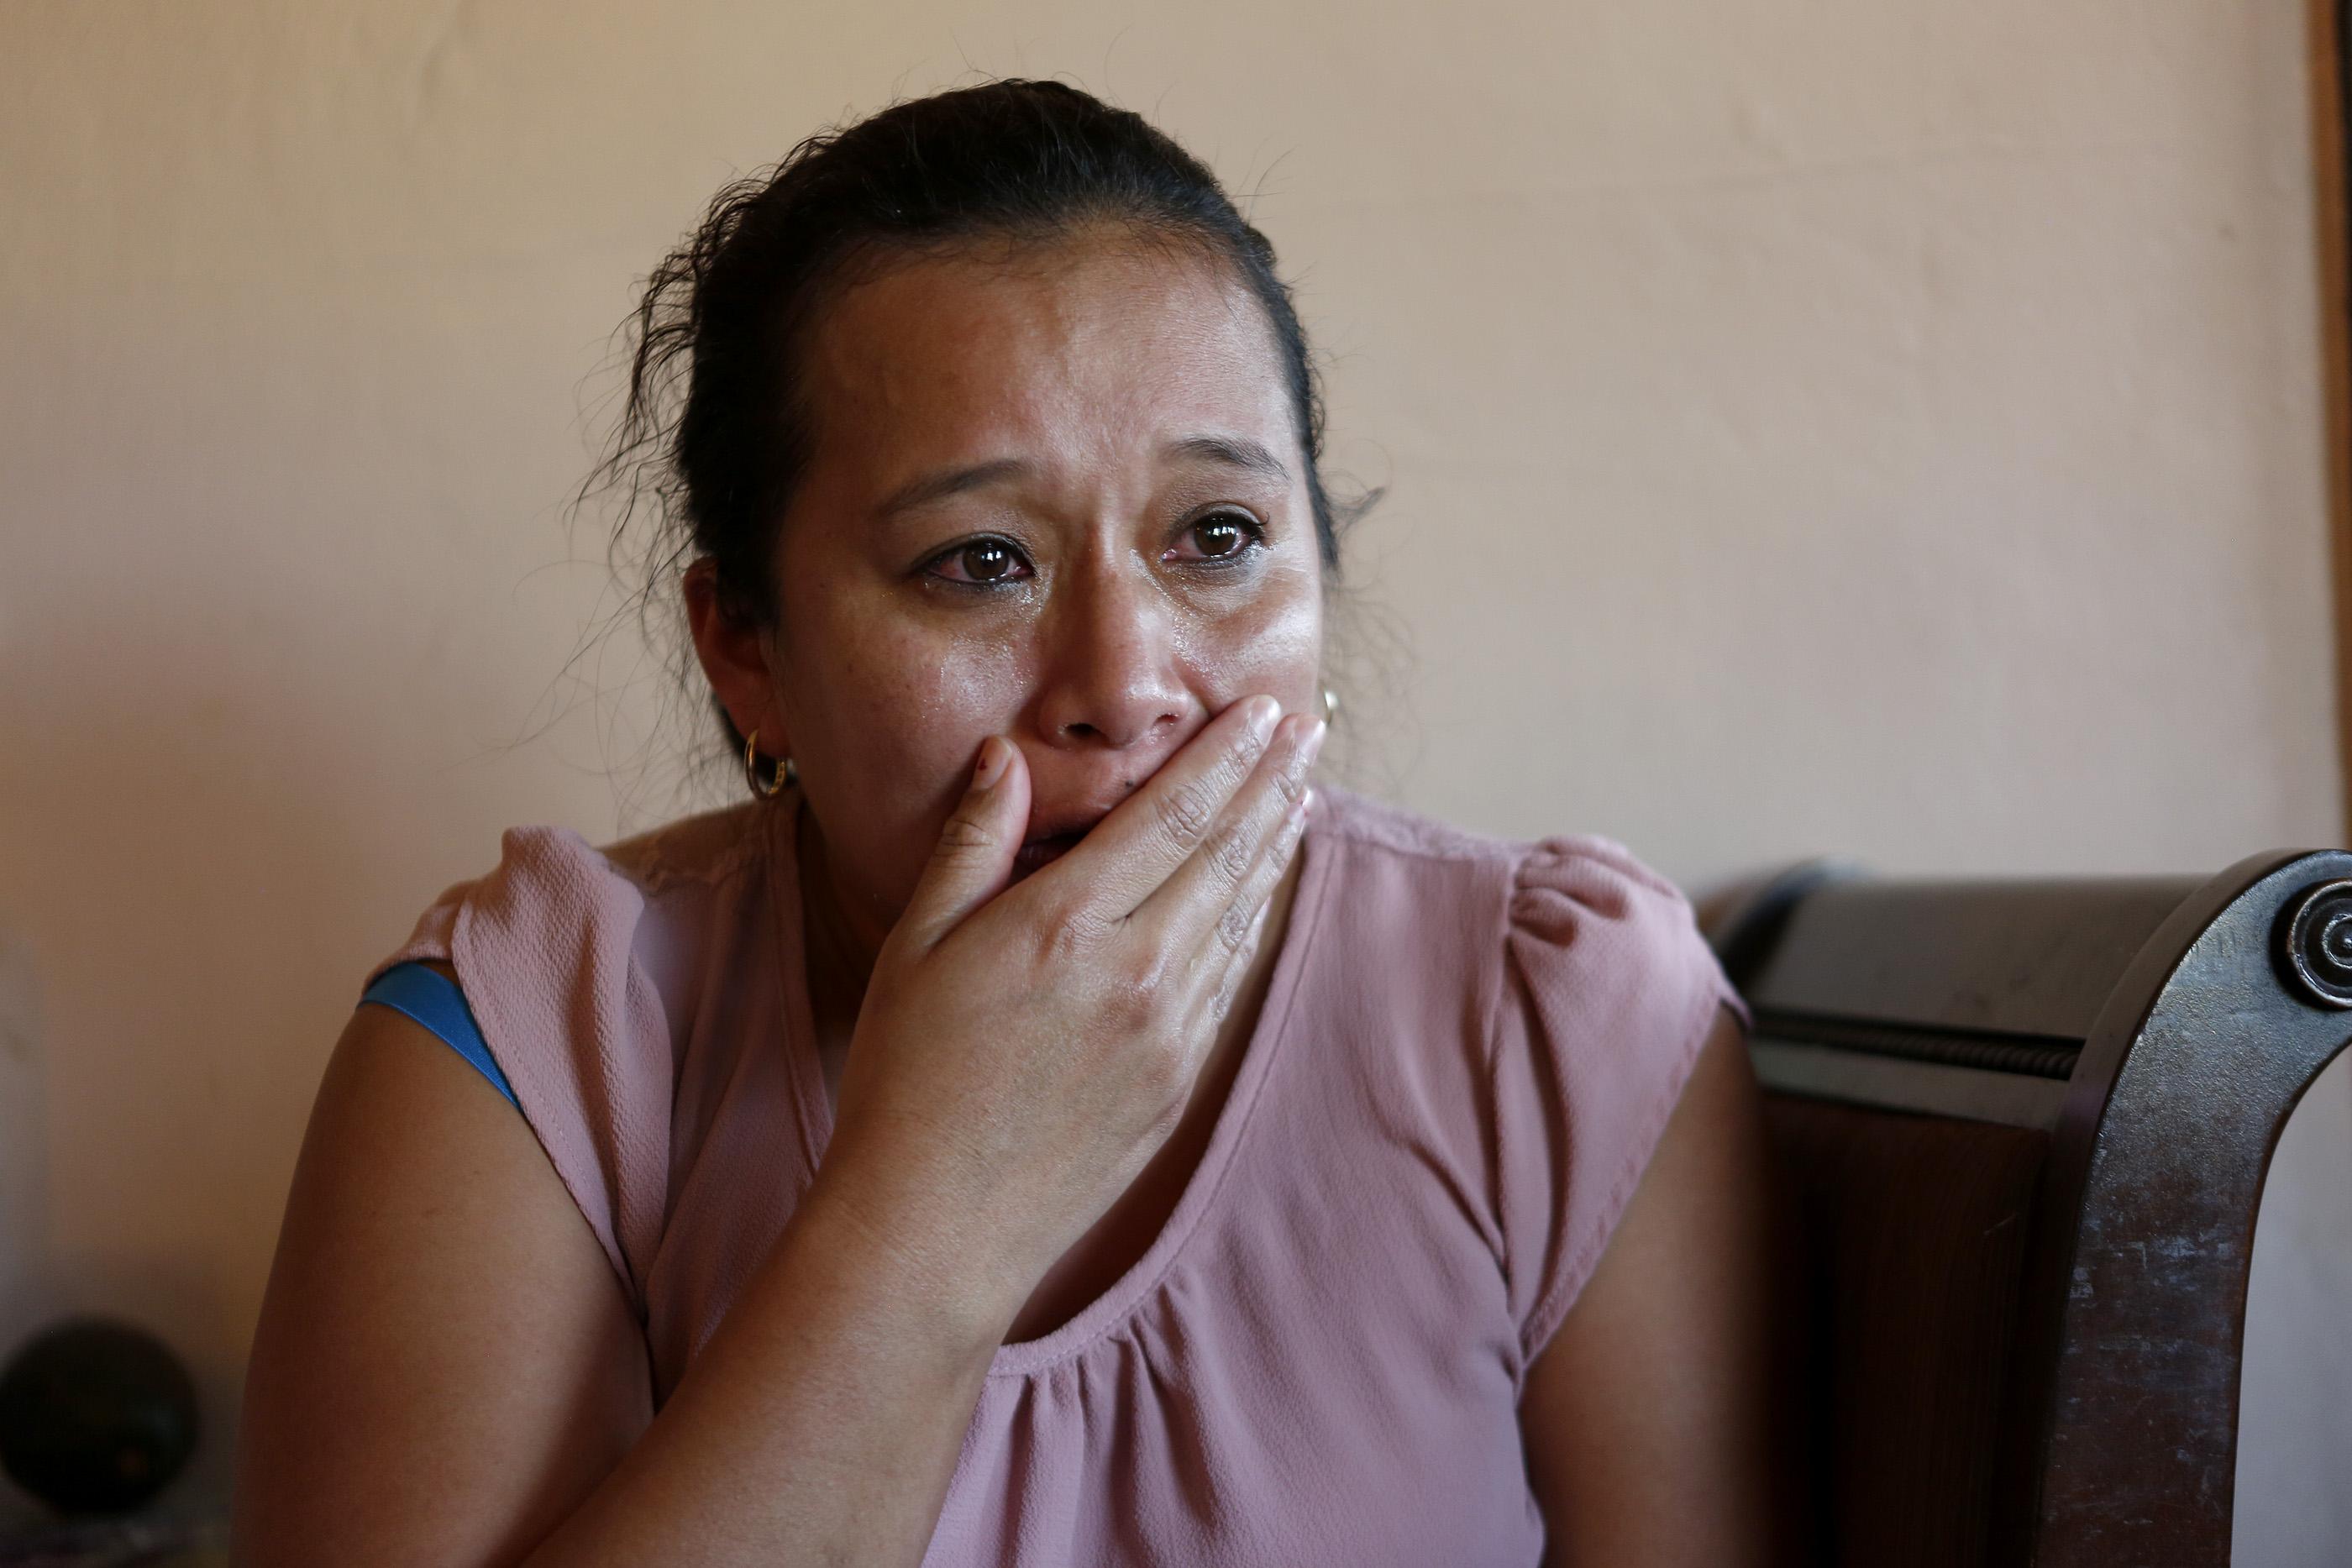 01/17/17/ LOS ANGELES/ Unaccompanied minor Kevin Cruz, from El Salvador, with his mother Lorena Angel and young sister Aileen Ramirez, 5, at their home in Huntington Park. (Photo Aurelia Ventura/ La Opinion)